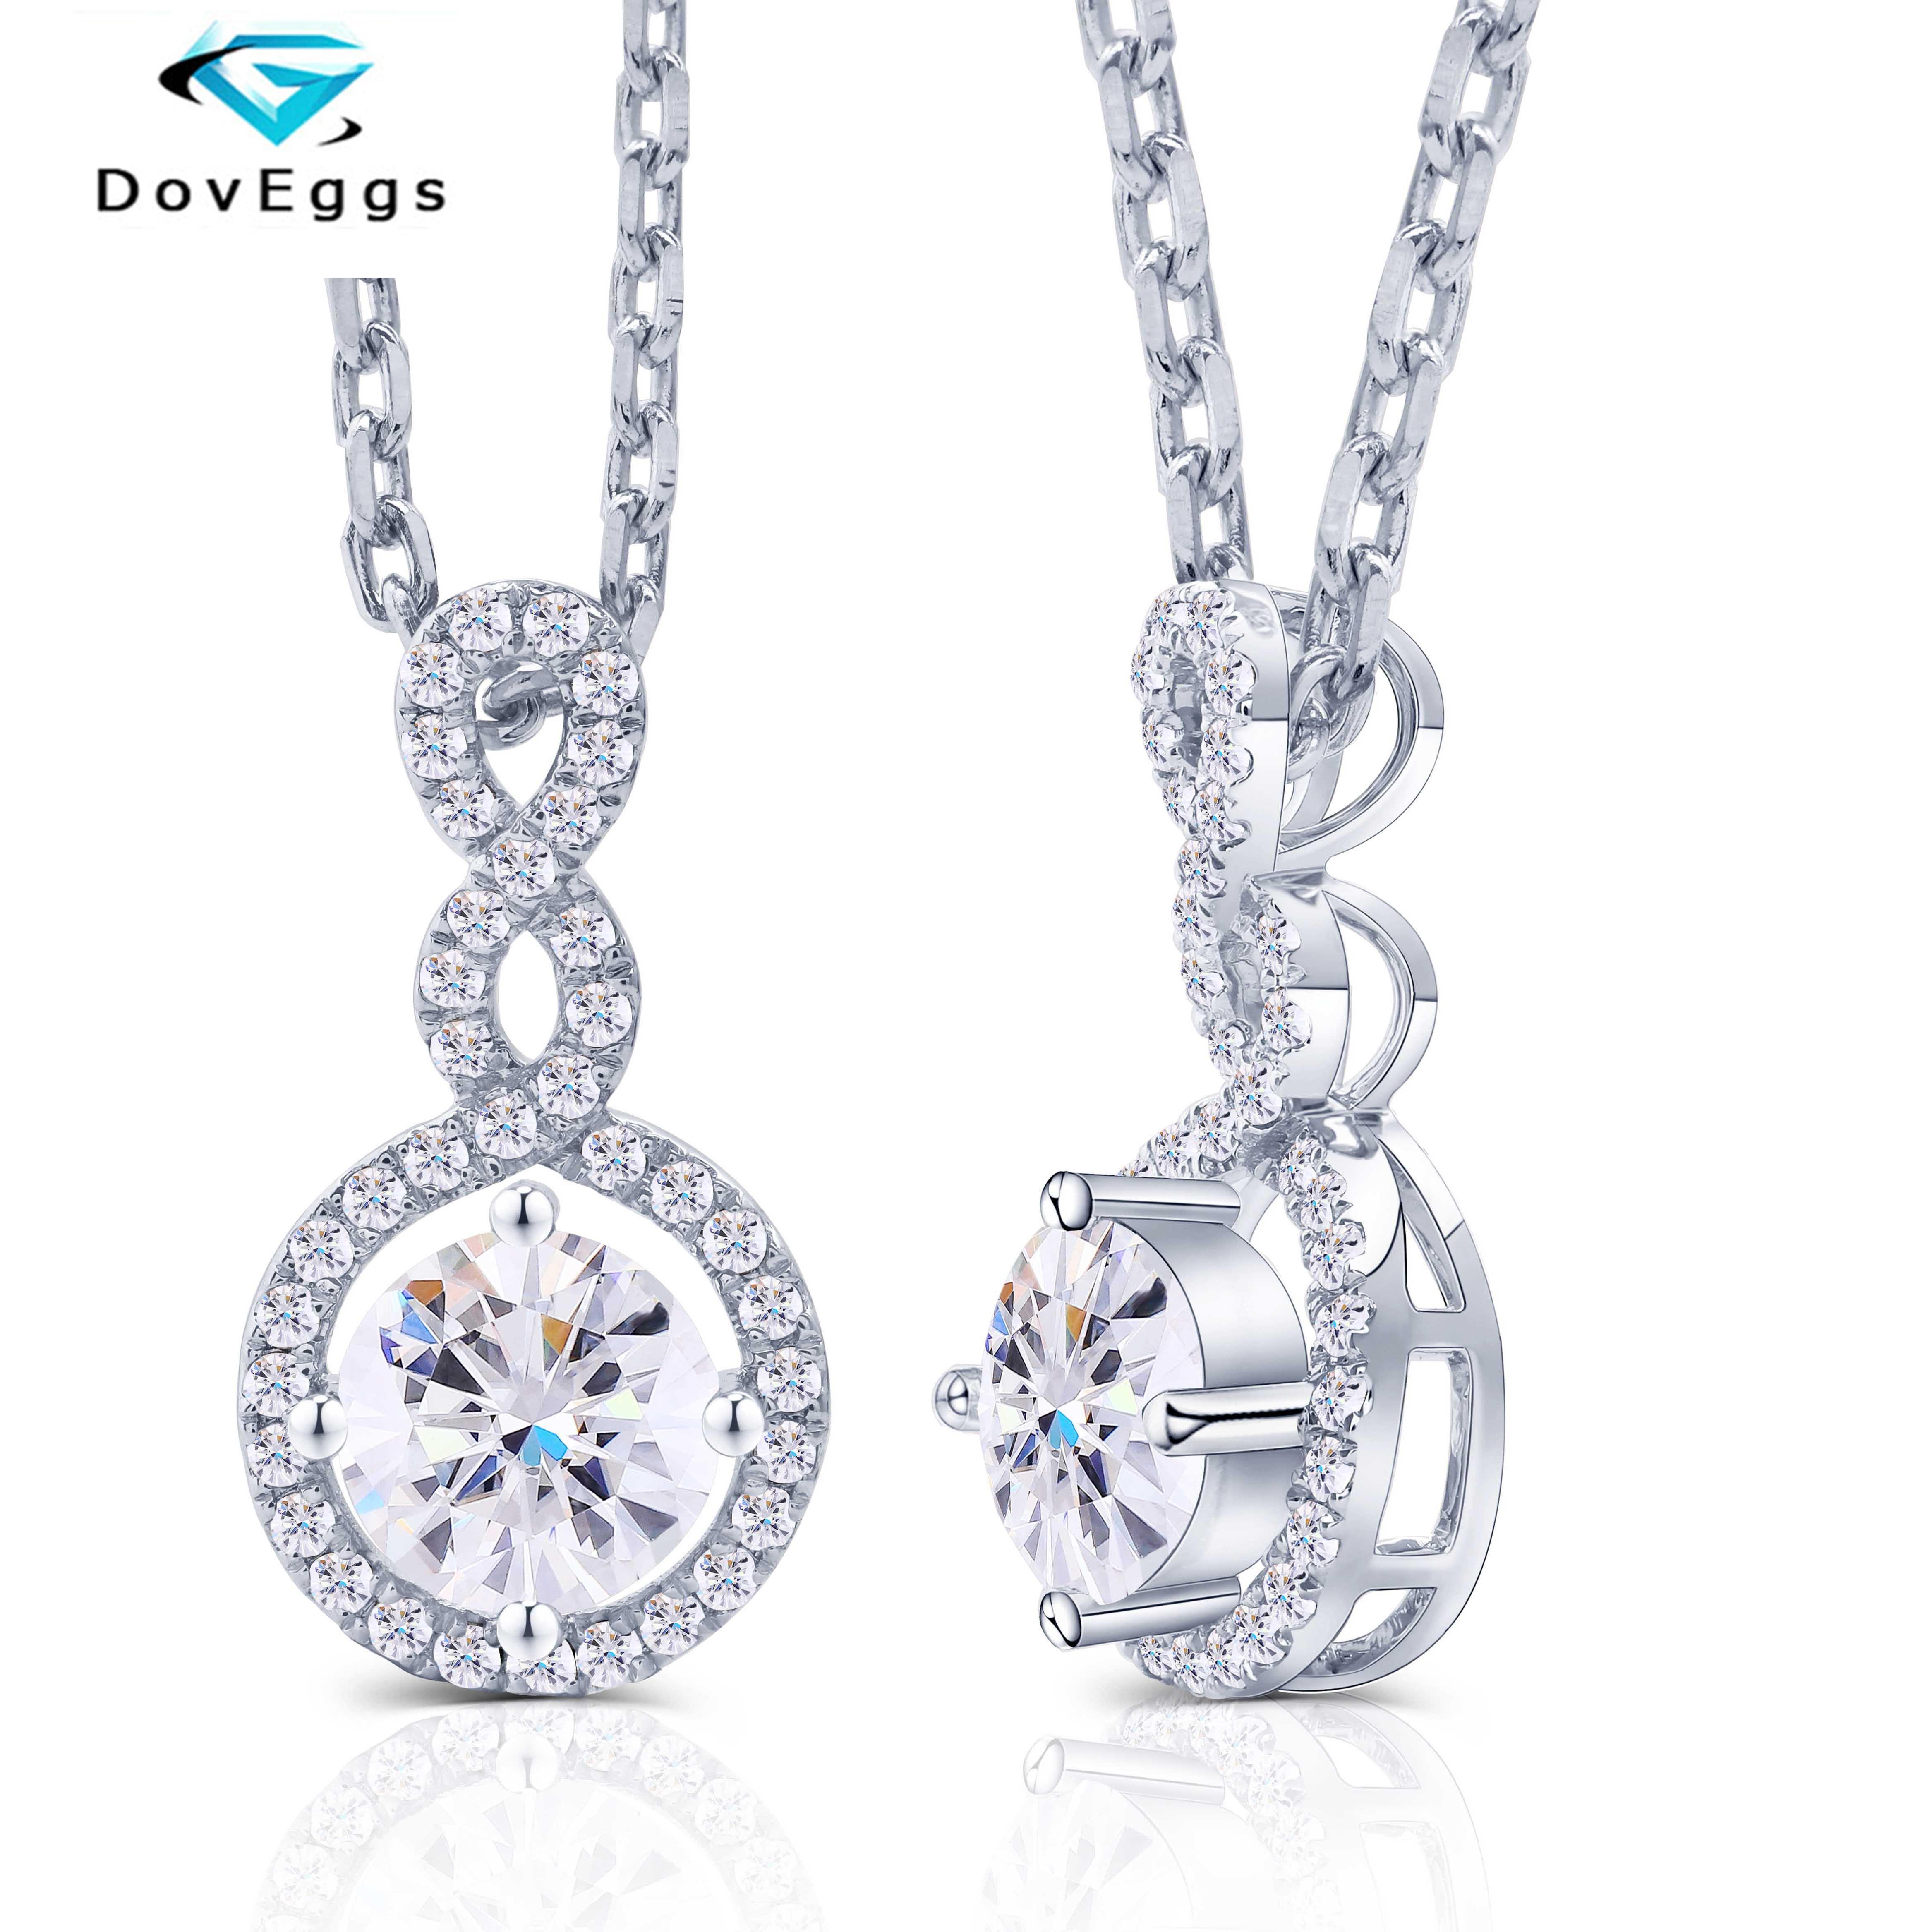 DovEggs Solid 14K 585 White Gold Center 1ct Carat 6.5mm F Color Moissanite Diamond Pendant Necklace For Women With Silver Chain